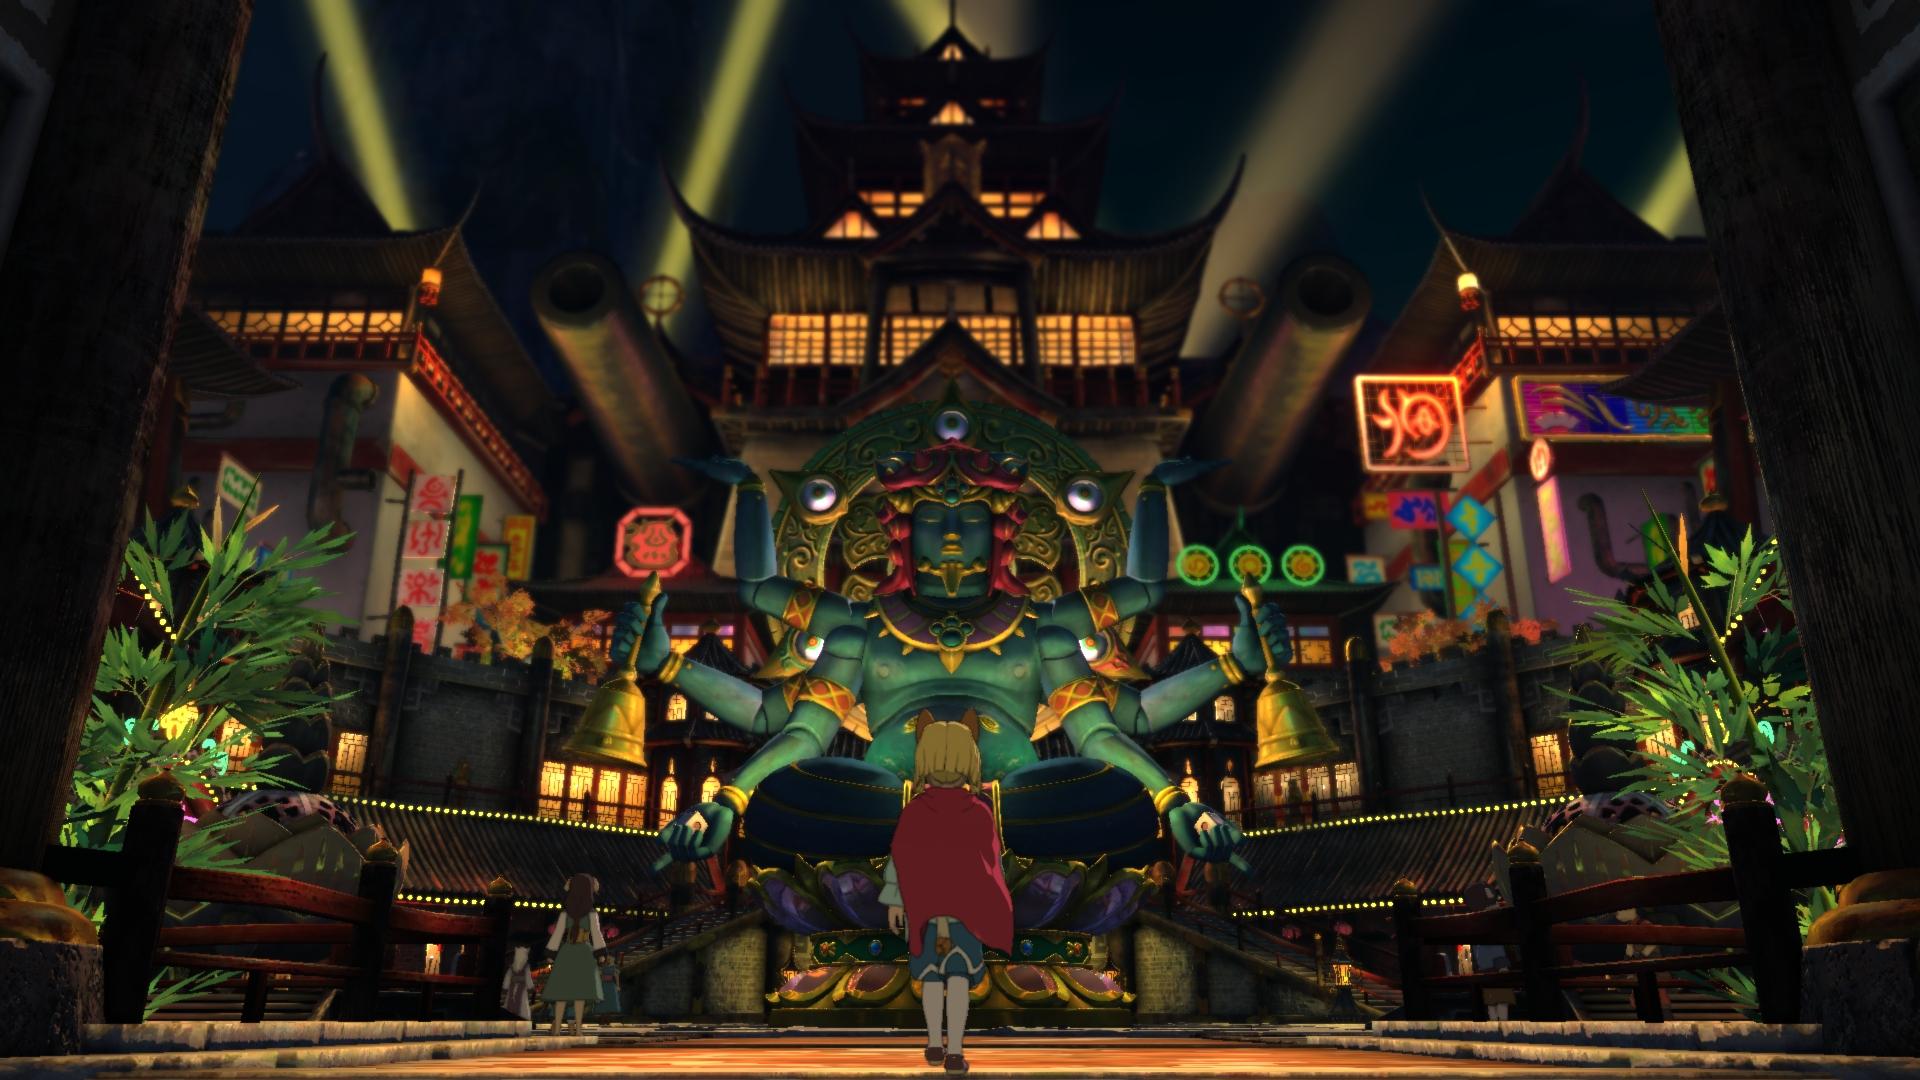 Ni no Kuni II: Revenant Kingdom v traileru a na screenshotech pro letošní Gamescom 148576